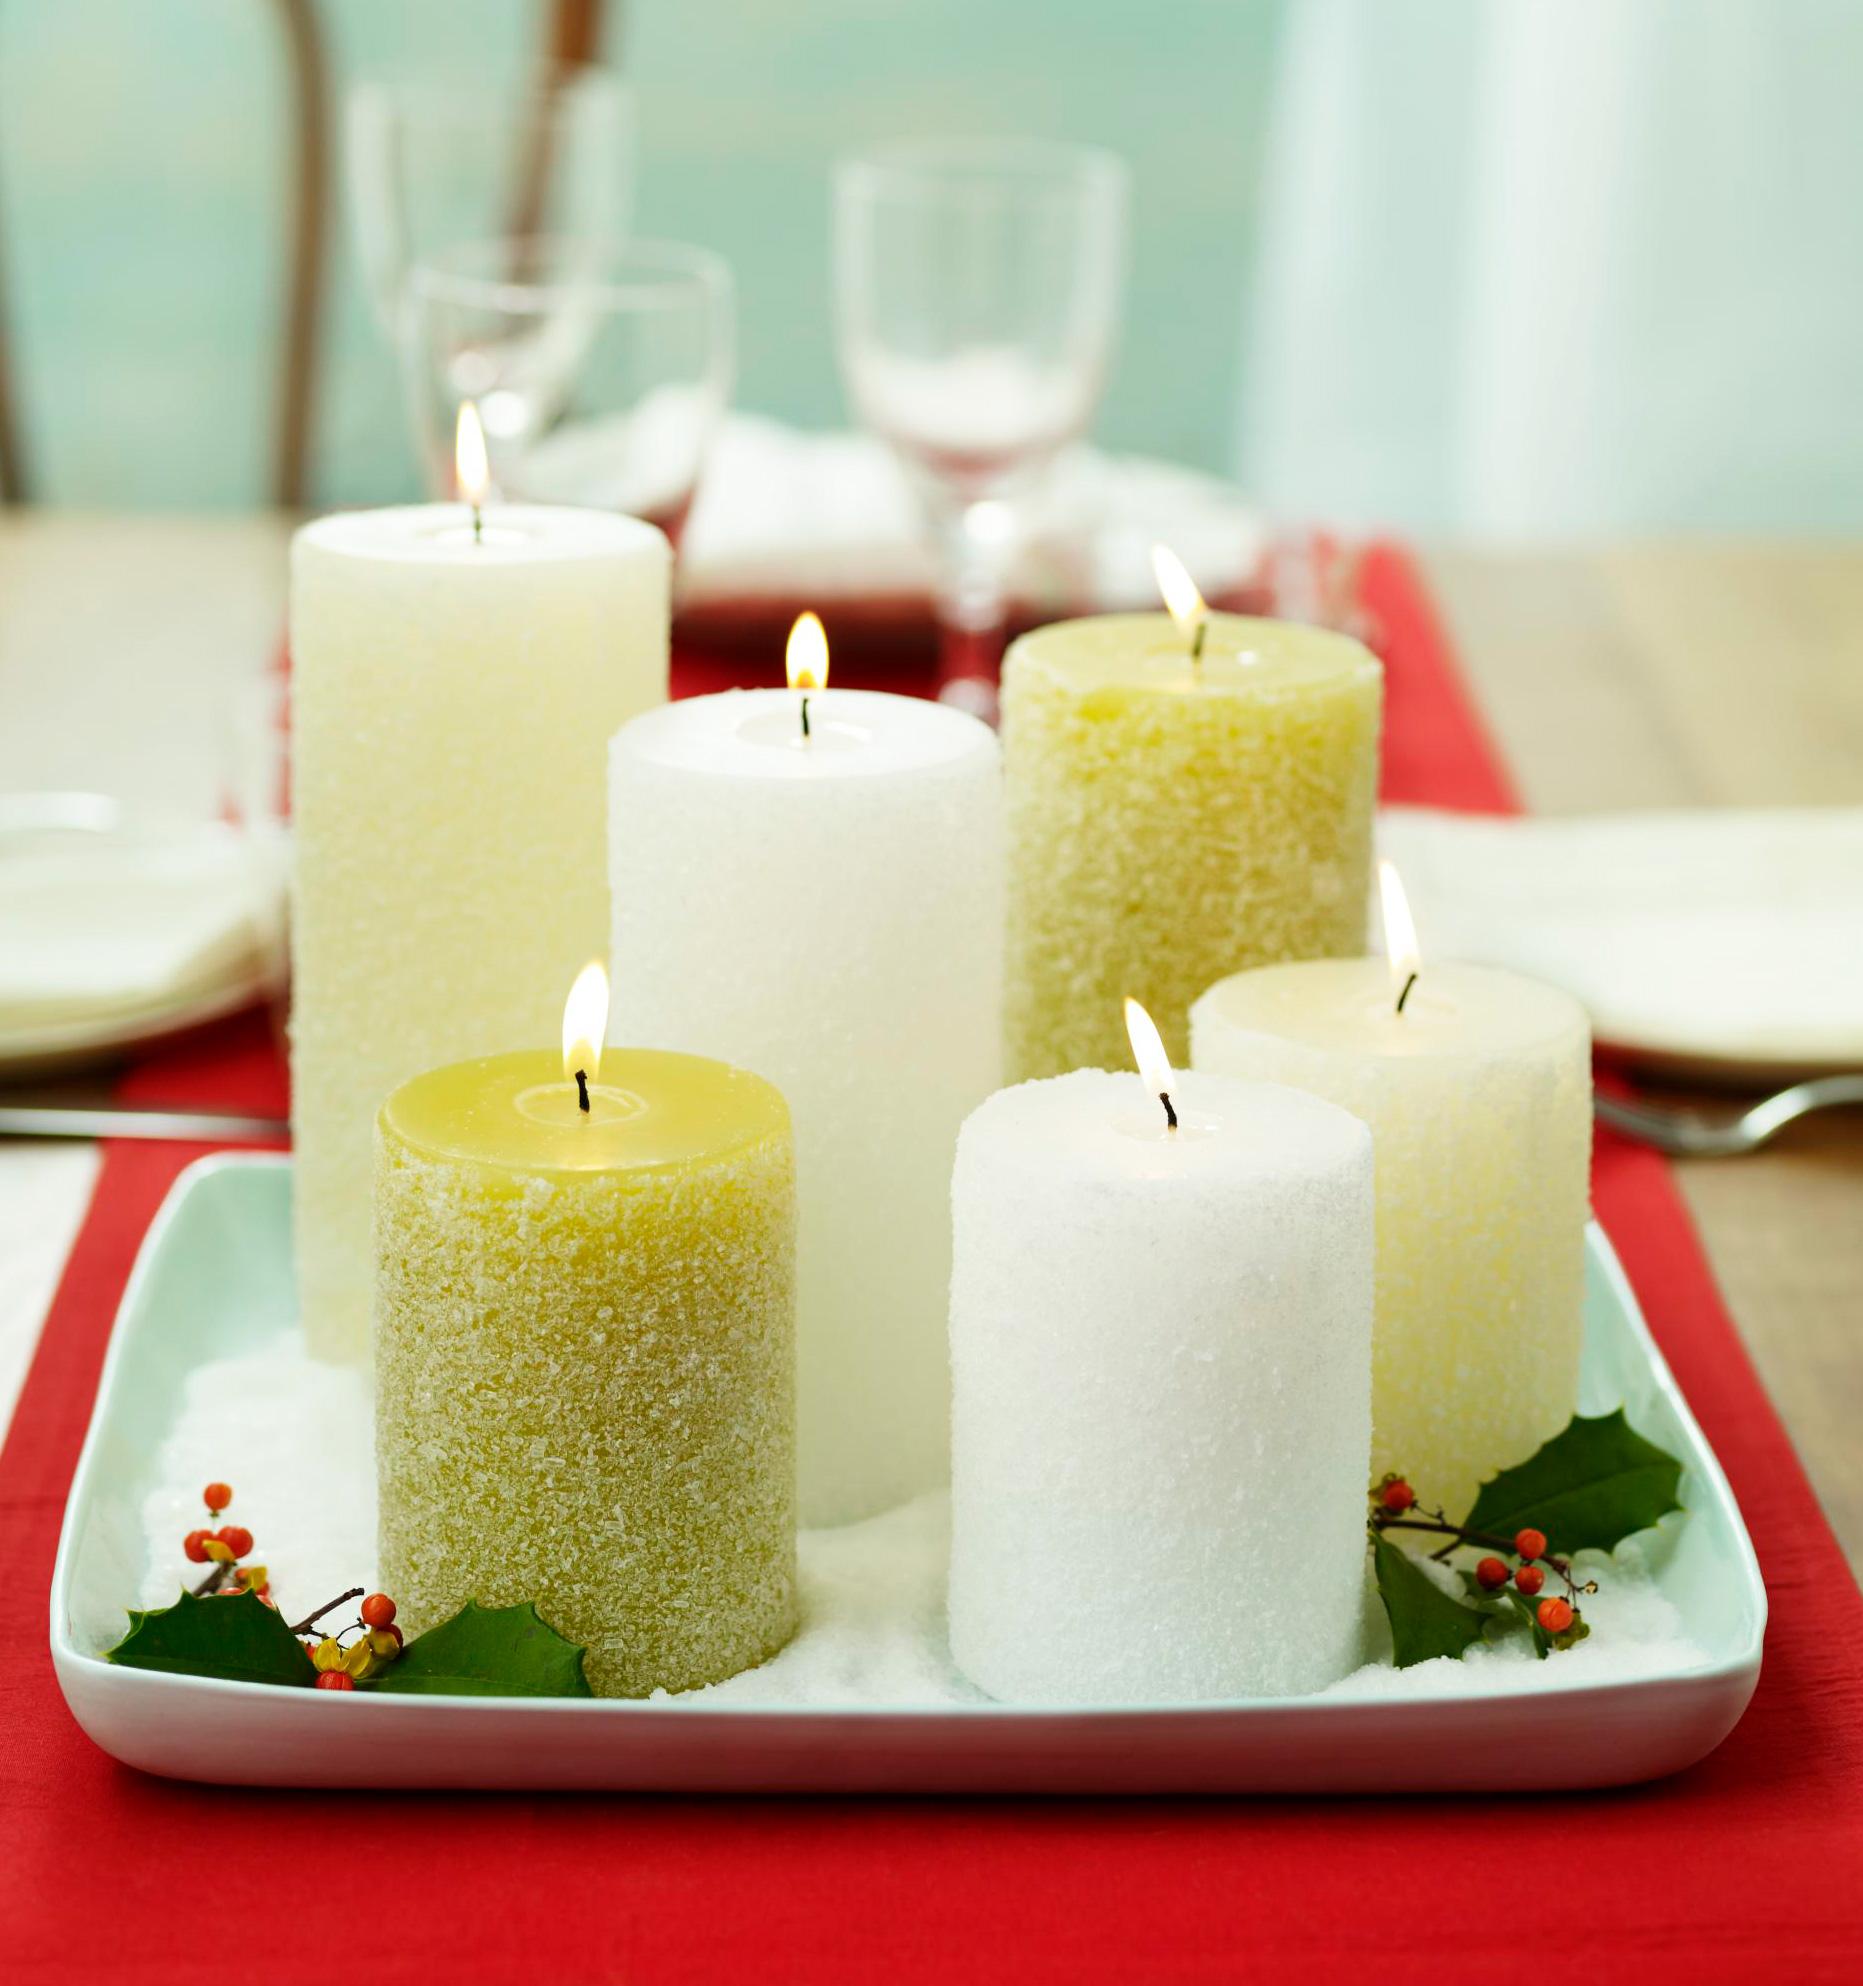 Christmas centerpiece ideas: sparkle candles